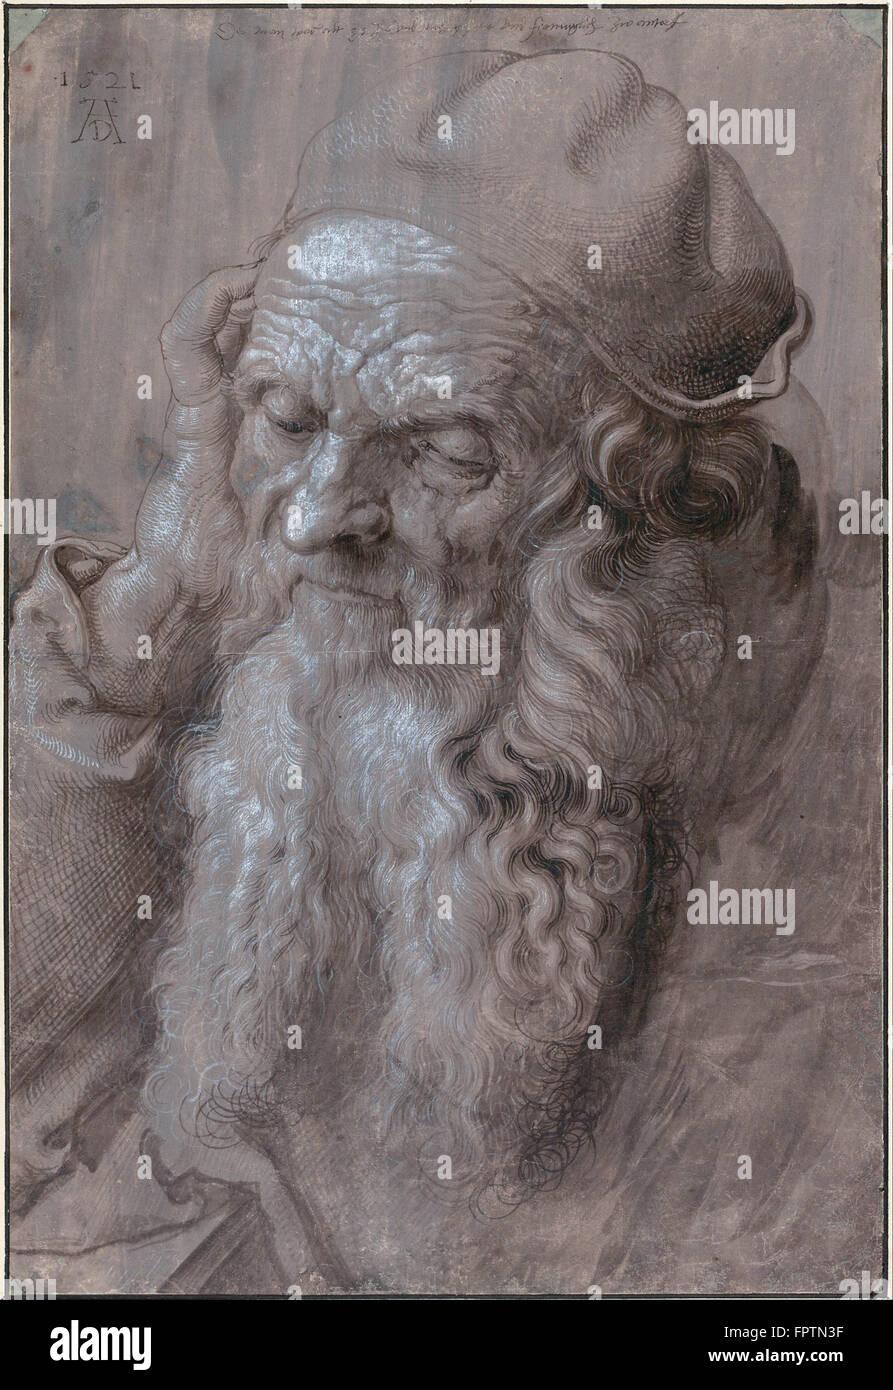 Albrecht Dürer - Kopf eines alten Mannes - 1521 Stockbild